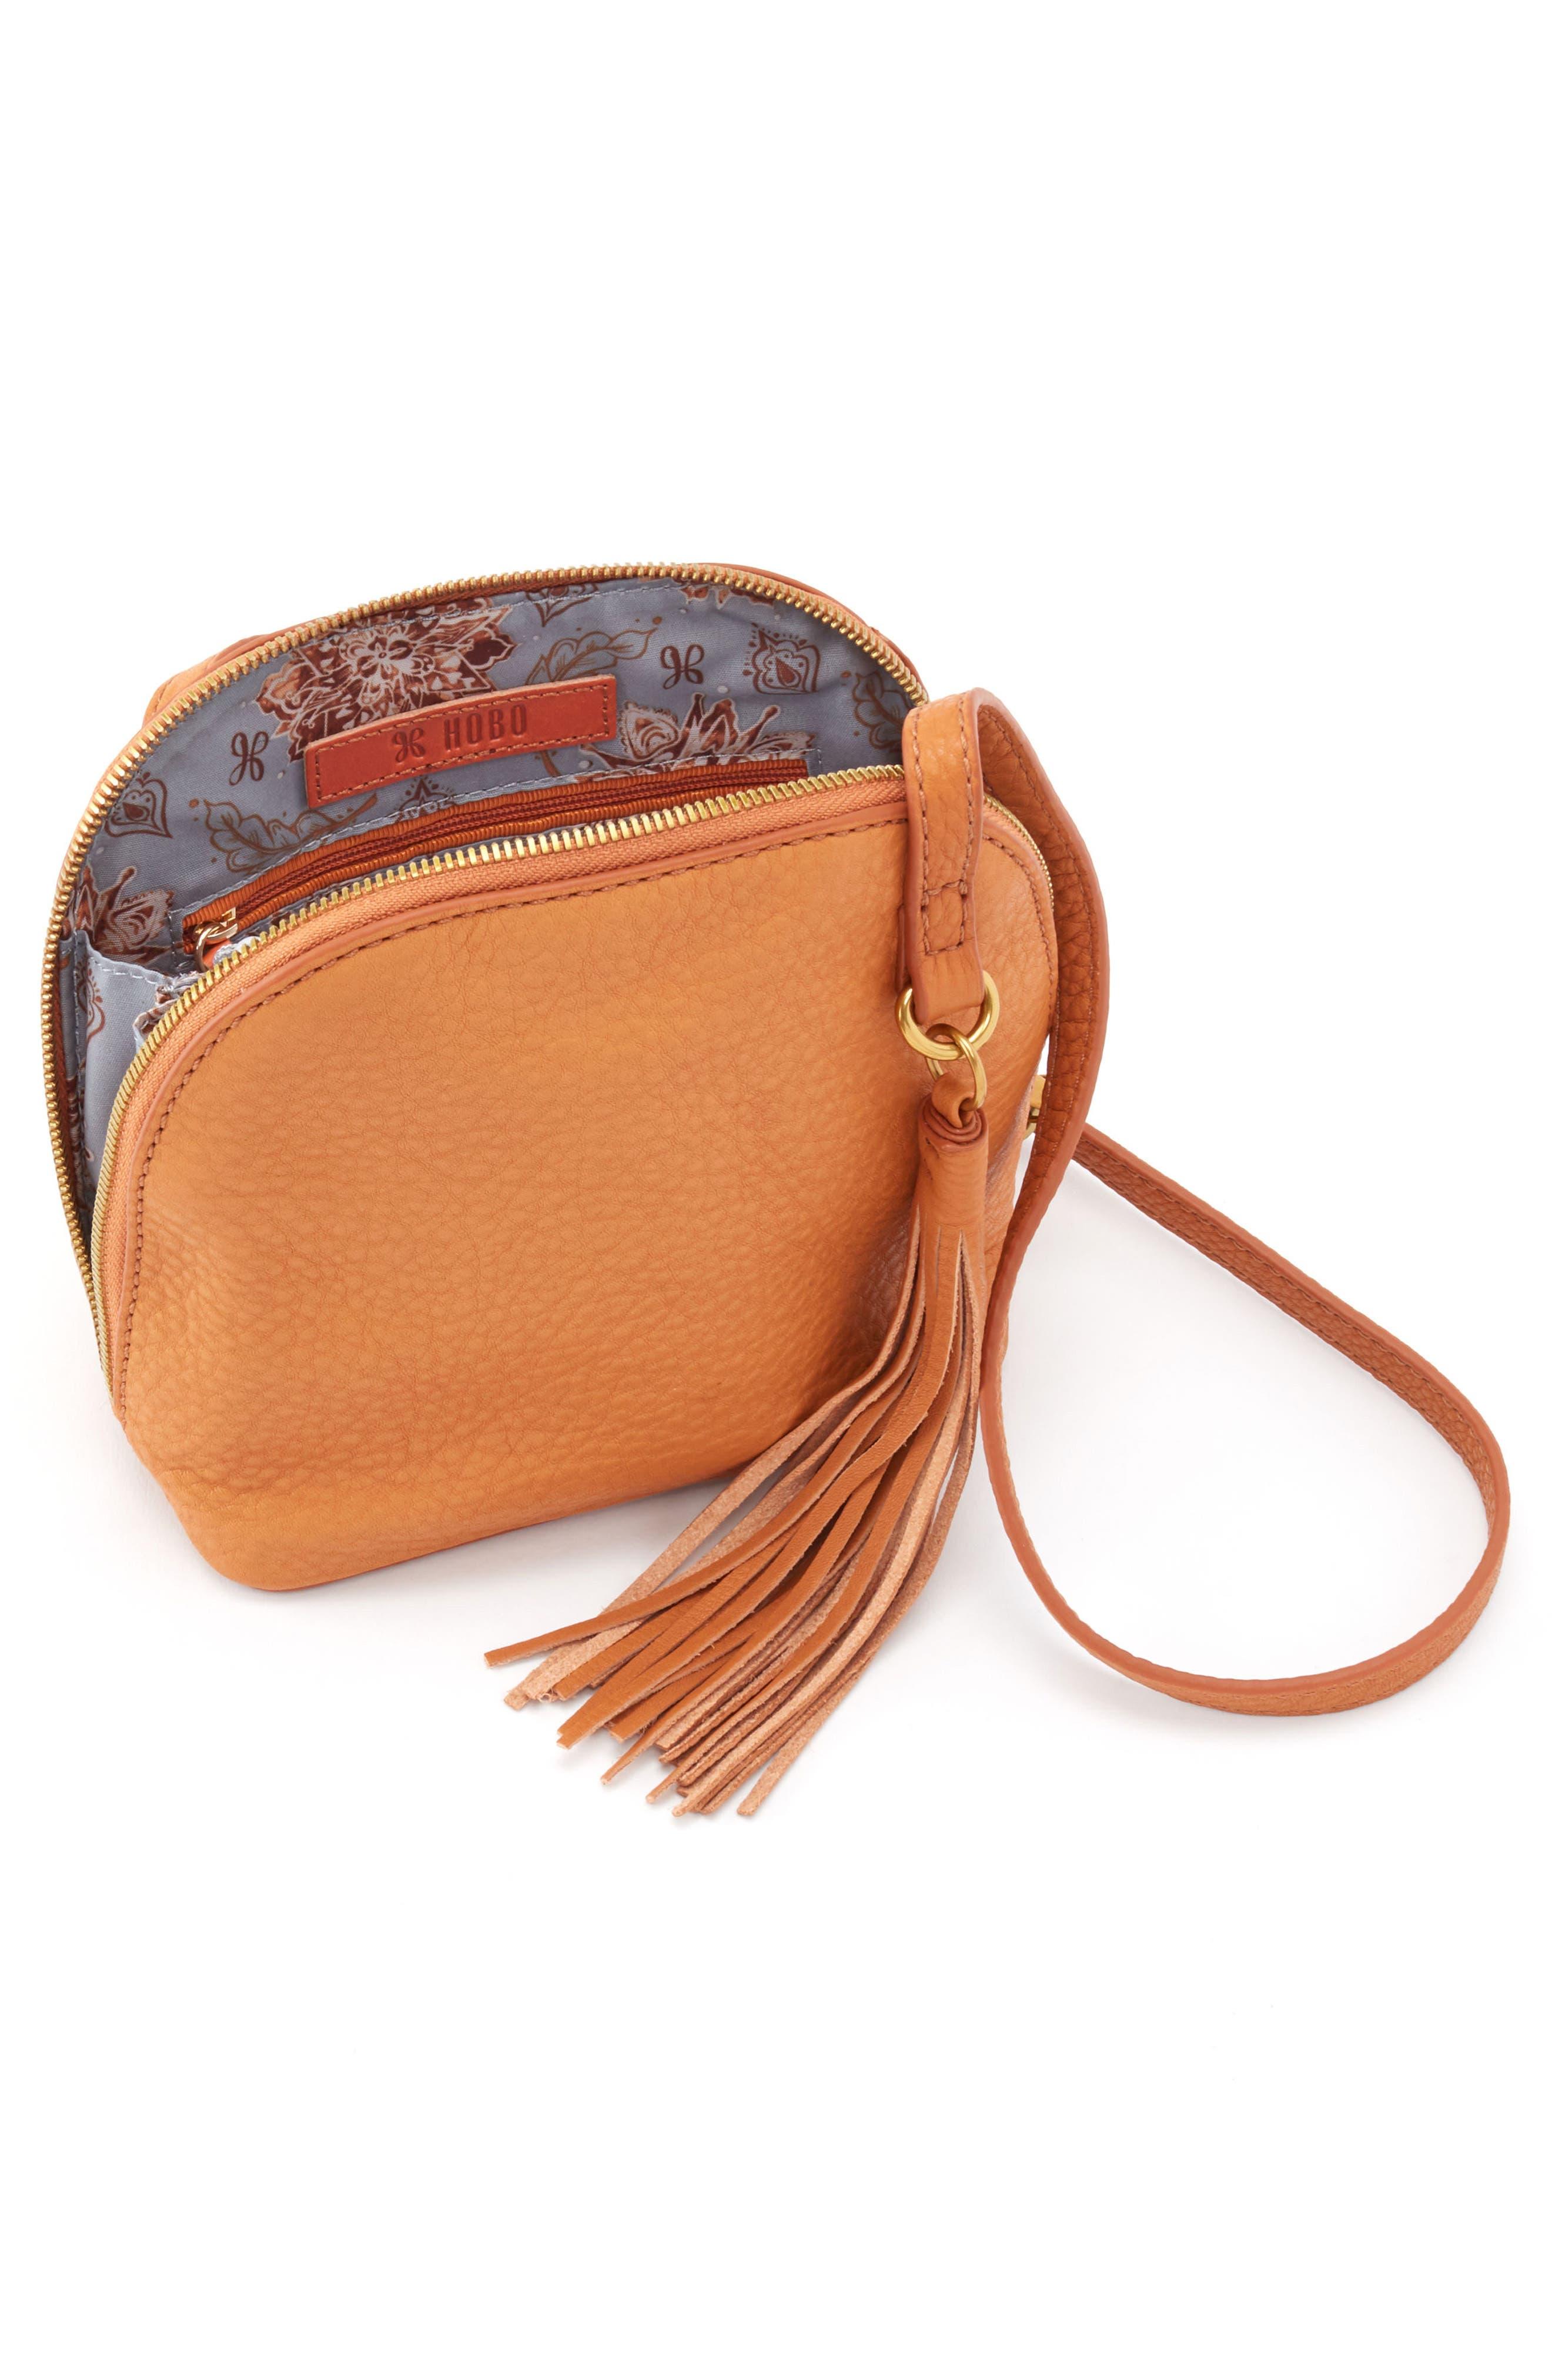 Nash Calfskin Leather Crossbody Bag,                             Alternate thumbnail 3, color,                             WHISKEY